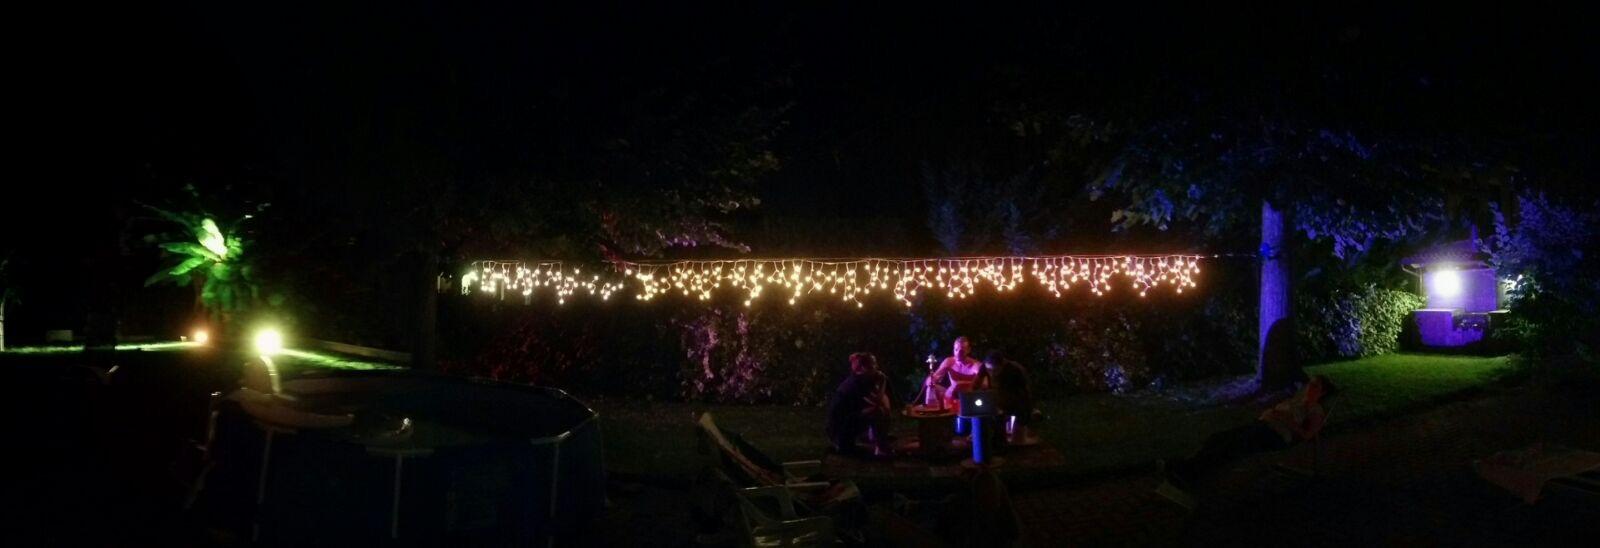 Party Garden Lights